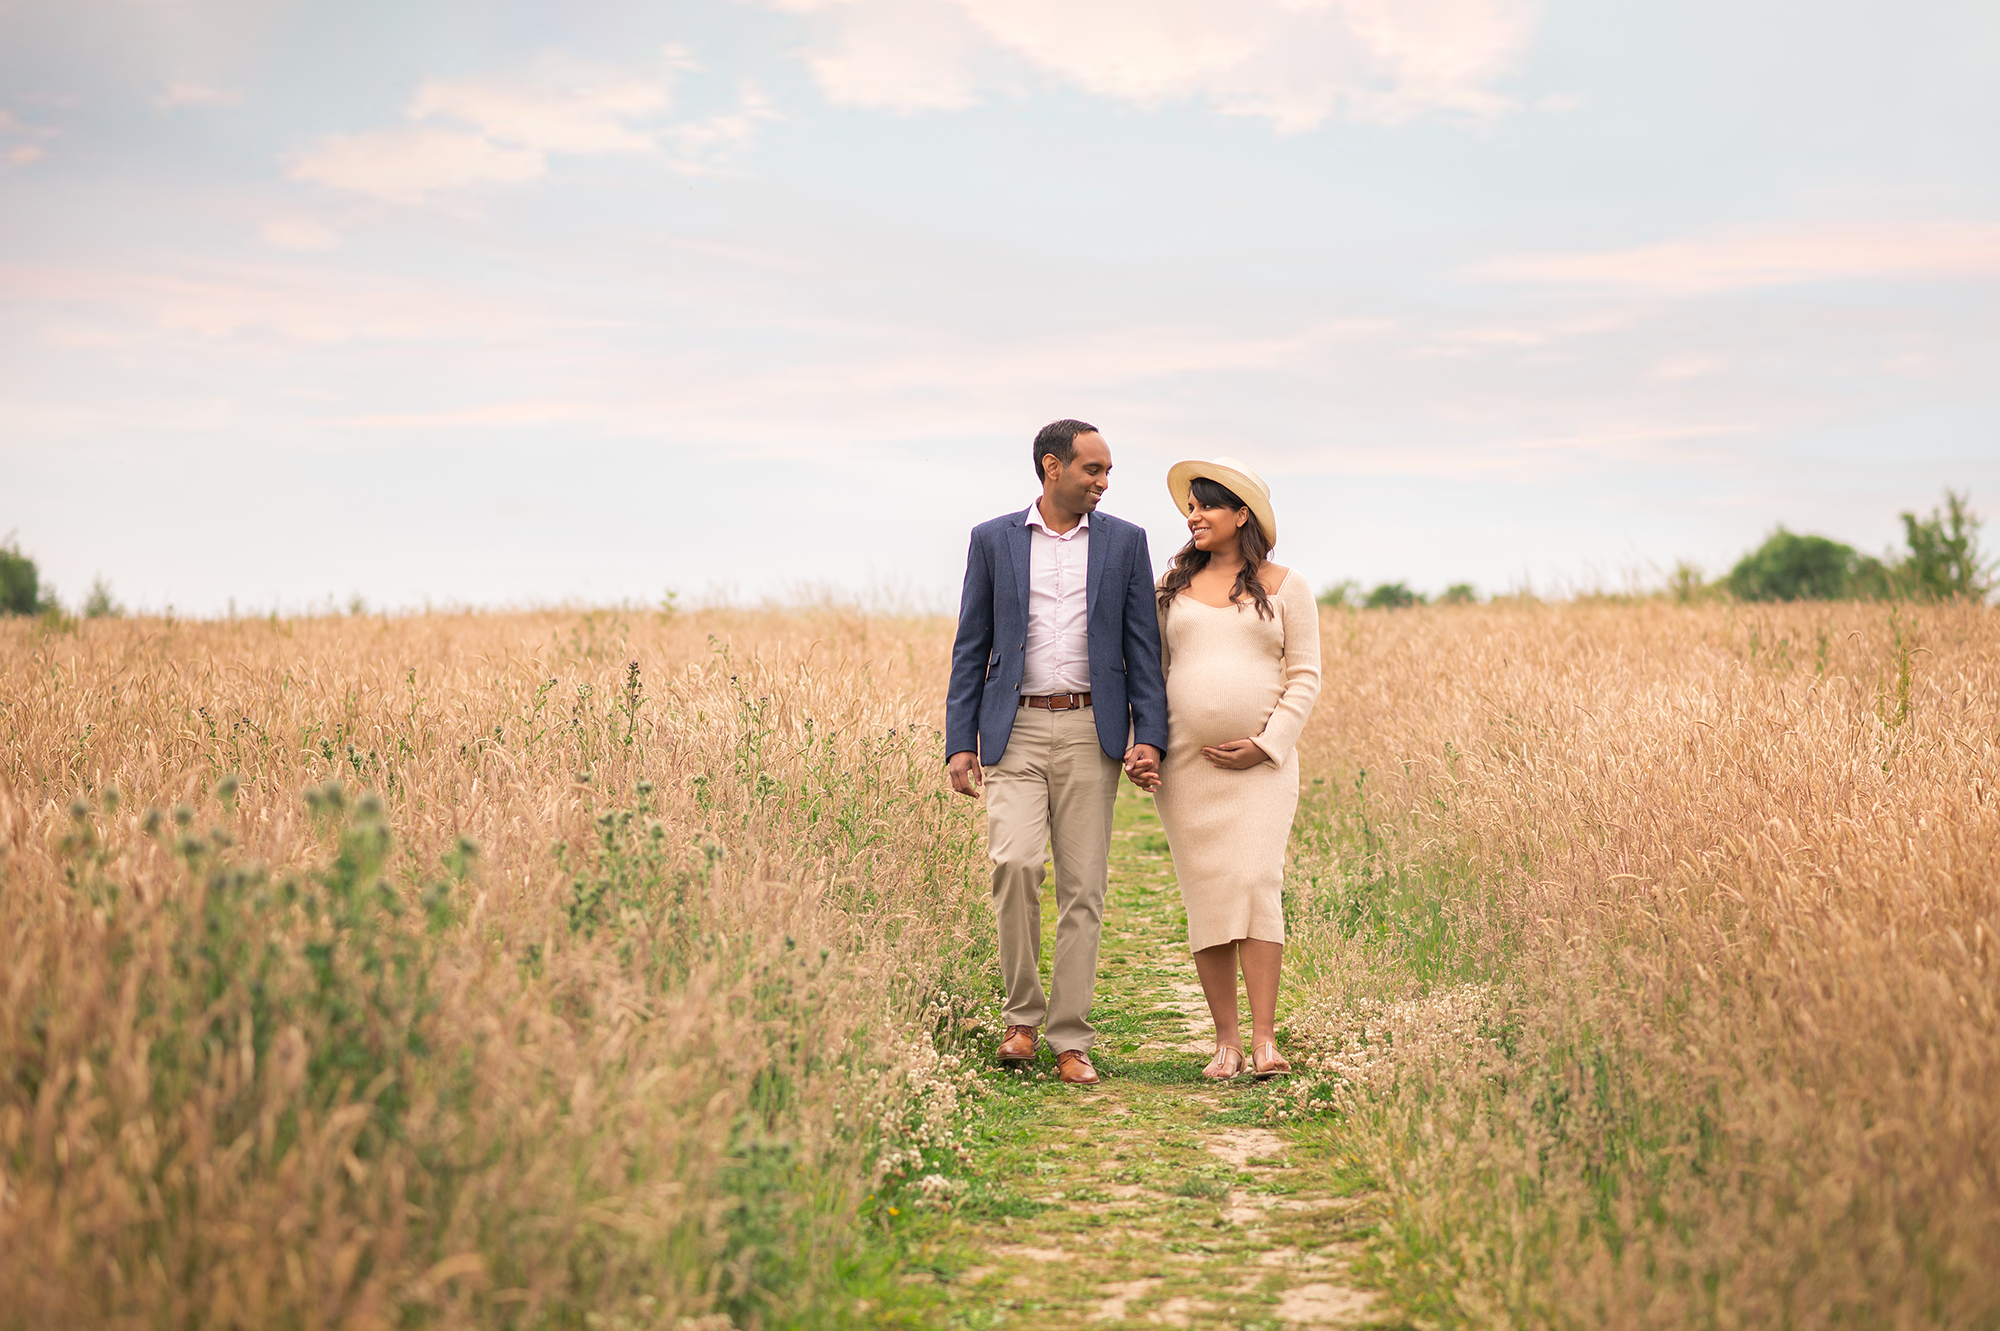 maternity photographer, couple walking towards the camera